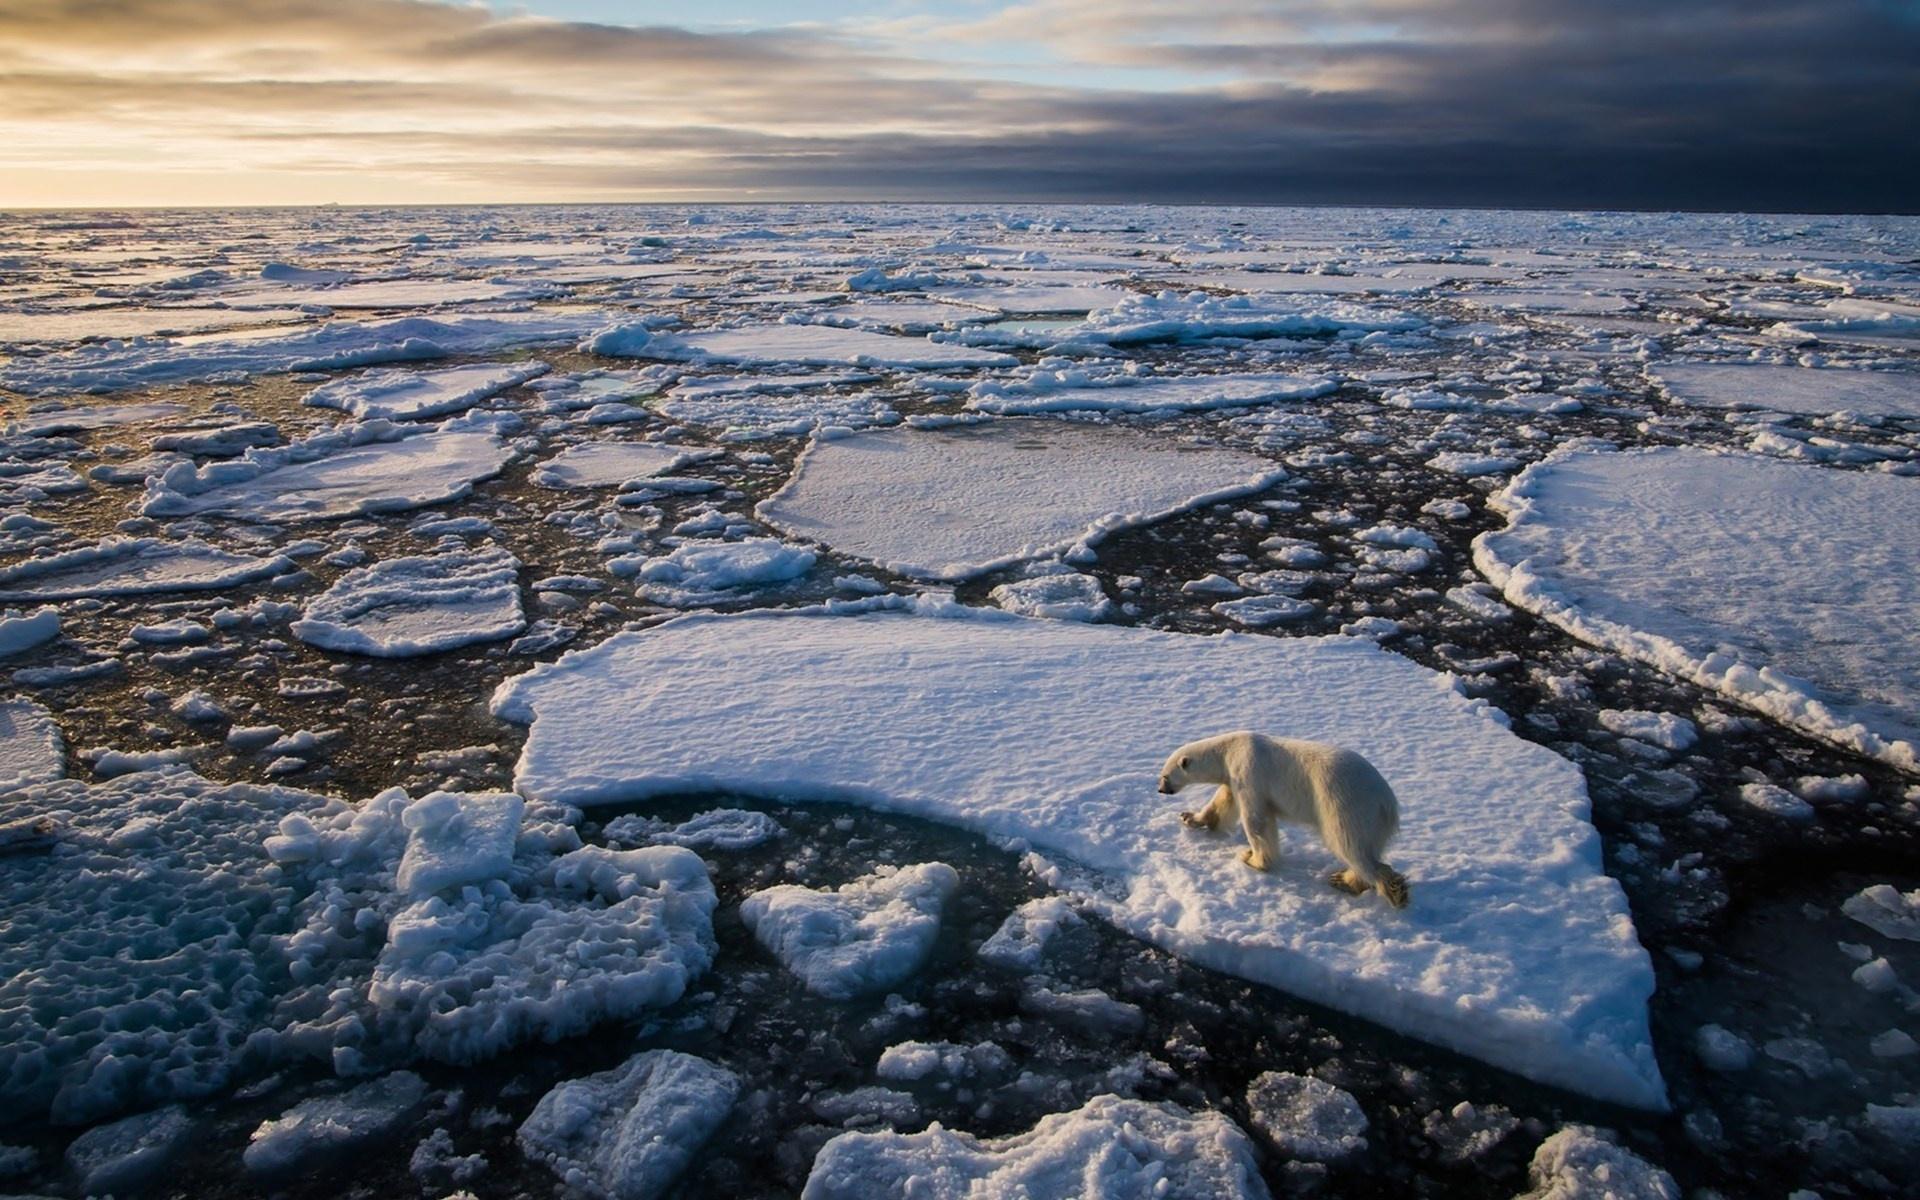 Polar bear ice floe ocean arctic winter g wallpaper ...